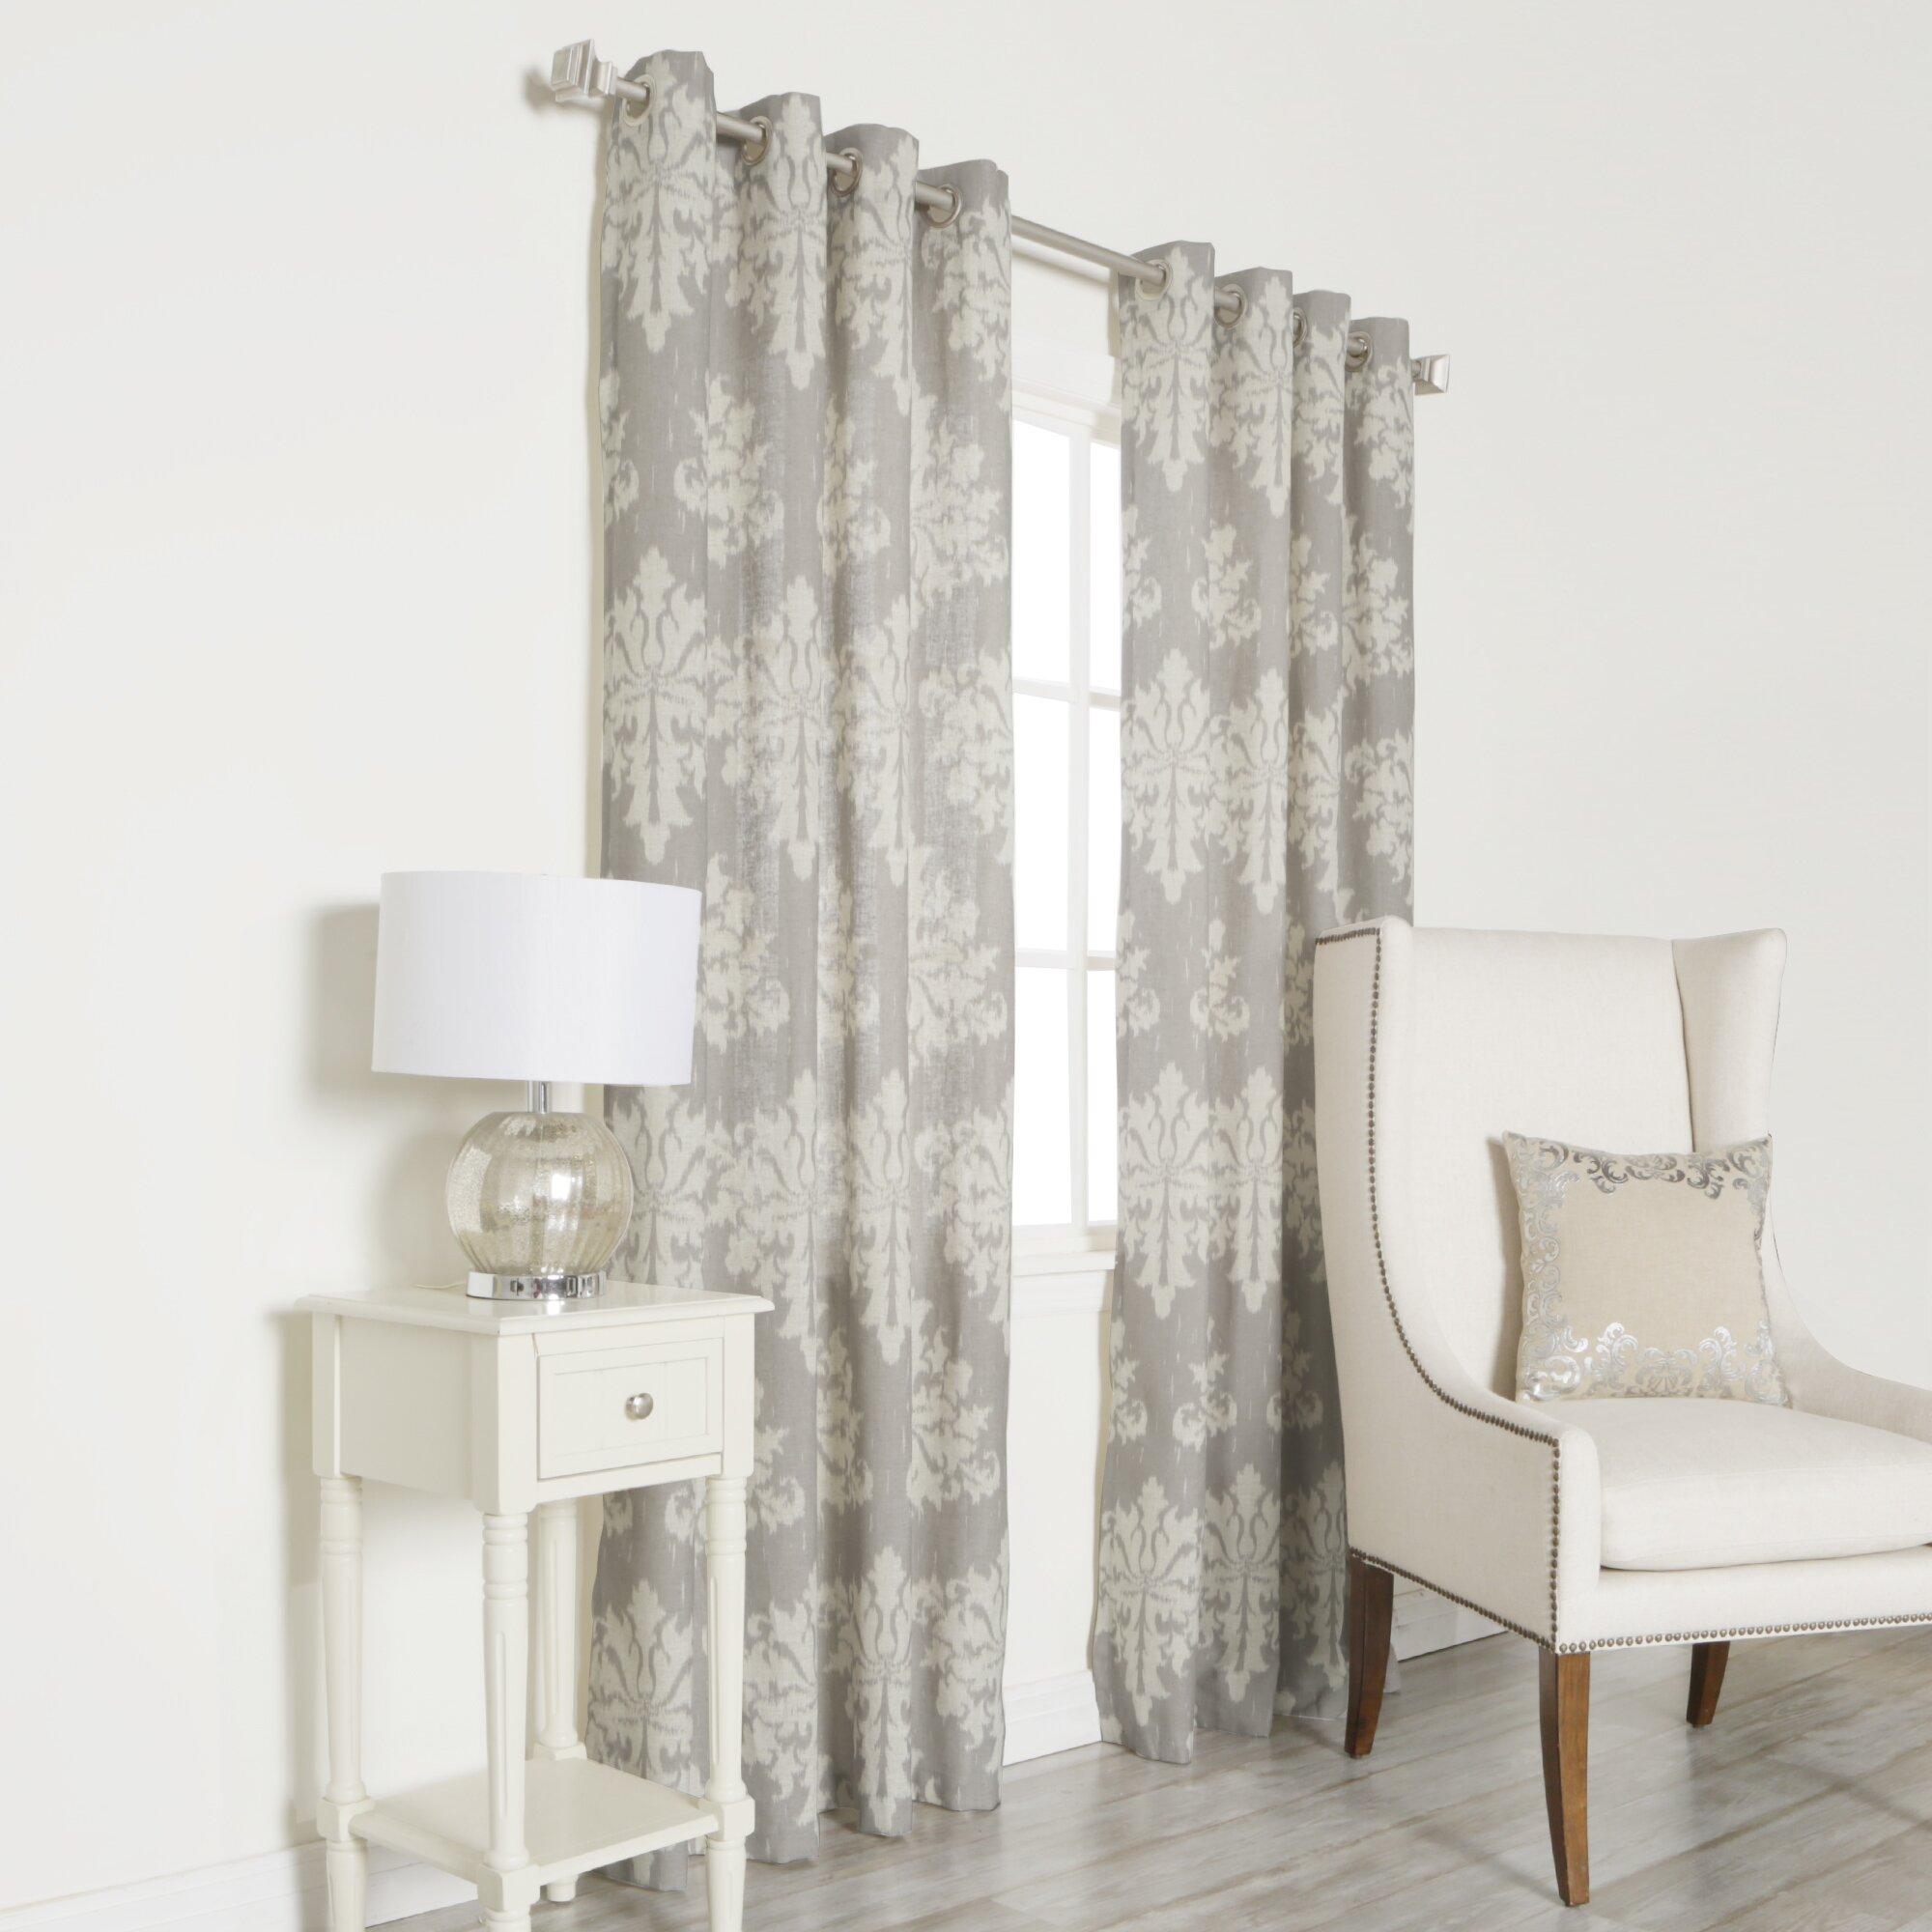 Best Home Fashion Inc Linen Blend Grommet Top Curtain Panels Reviews Wayfair